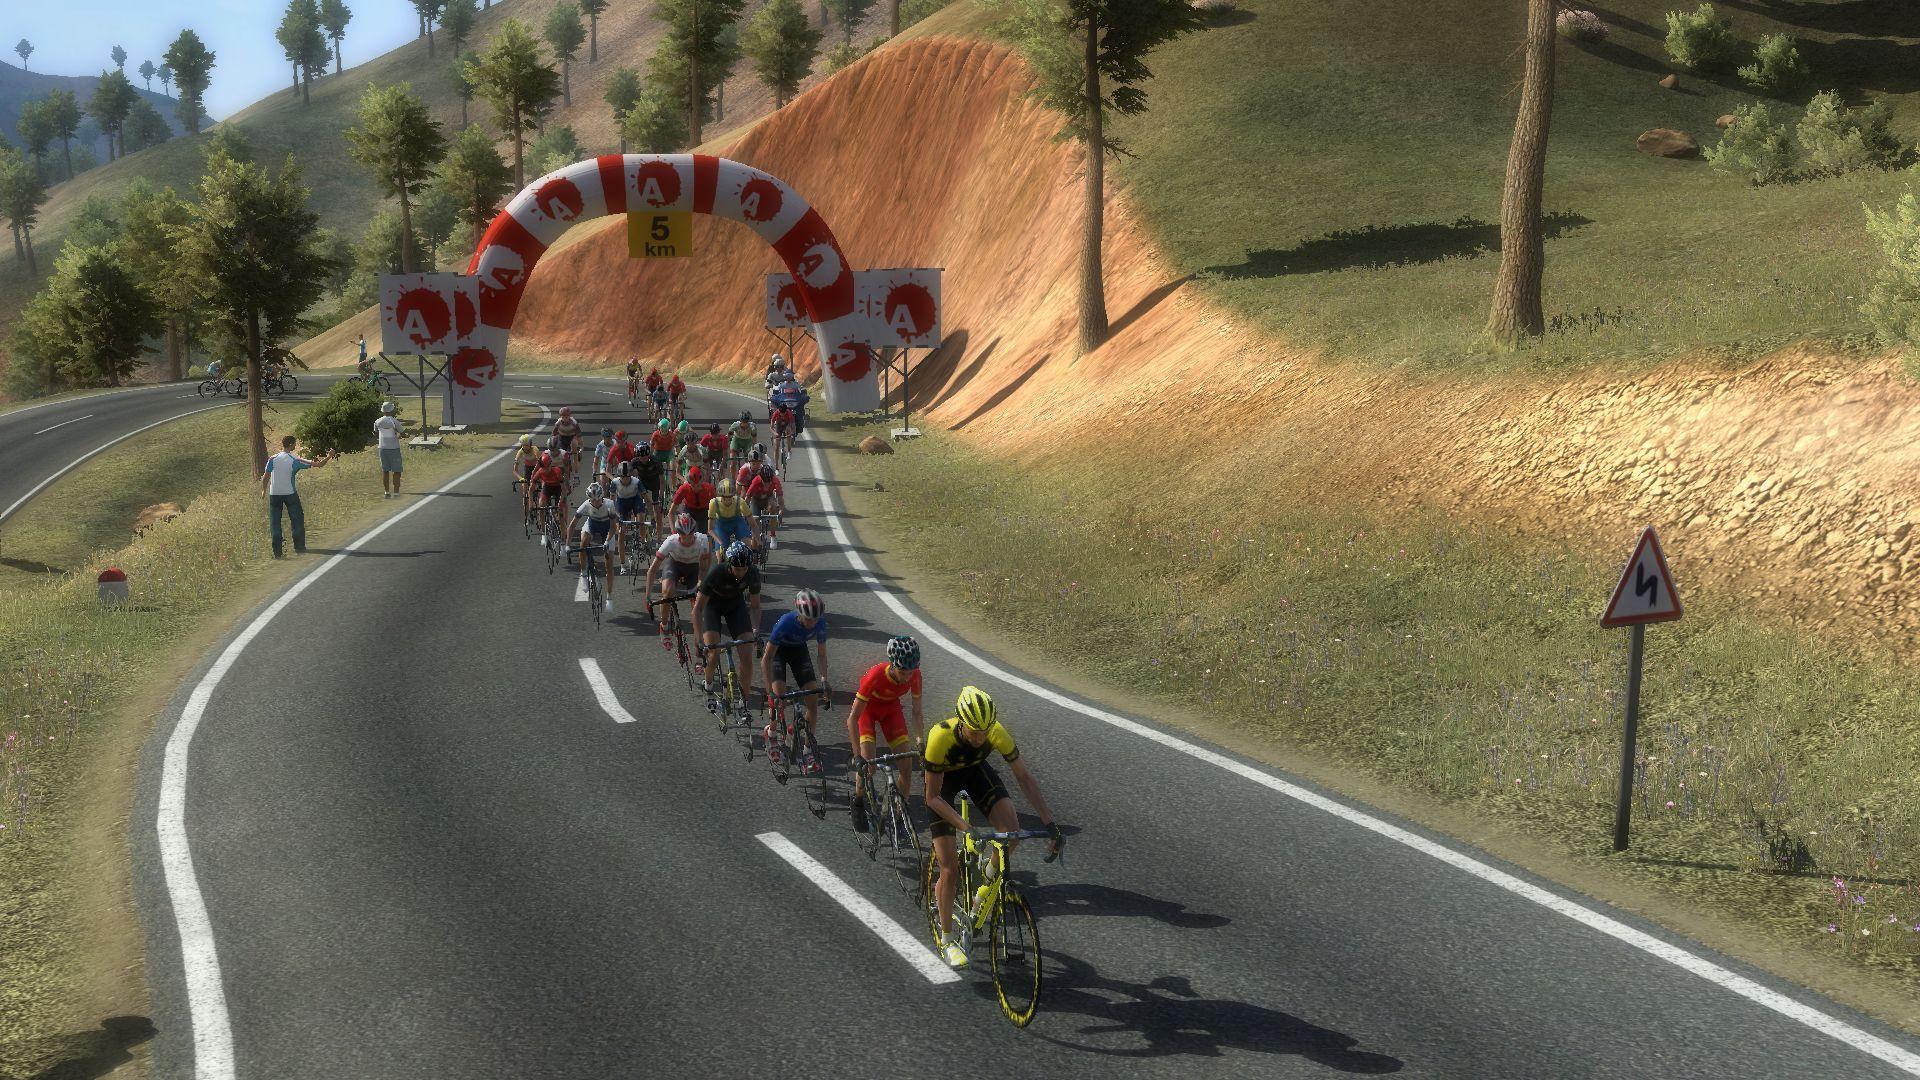 pcmdaily.com/images/mg/2020/Reports/HC/Corsica/CIS3%2020.jpg